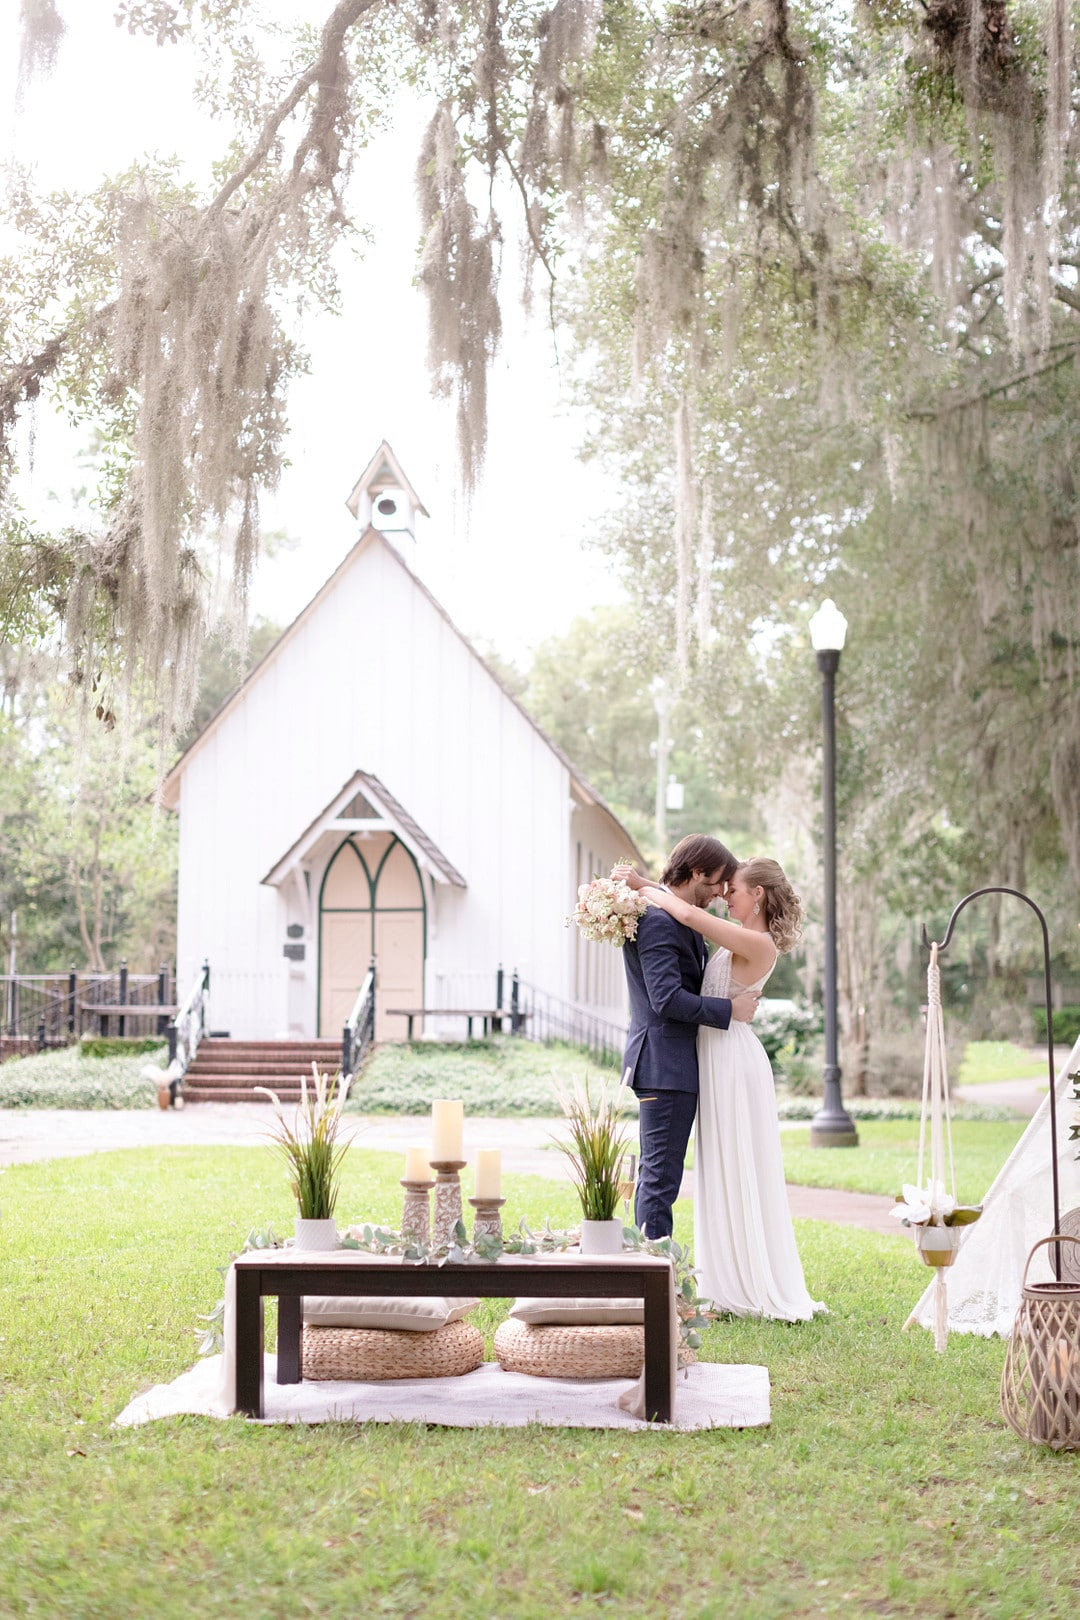 Elegant Boho Wedding Picnic_Susan Dixon Photography, LLC_susan-dixon-005 + light flare_low